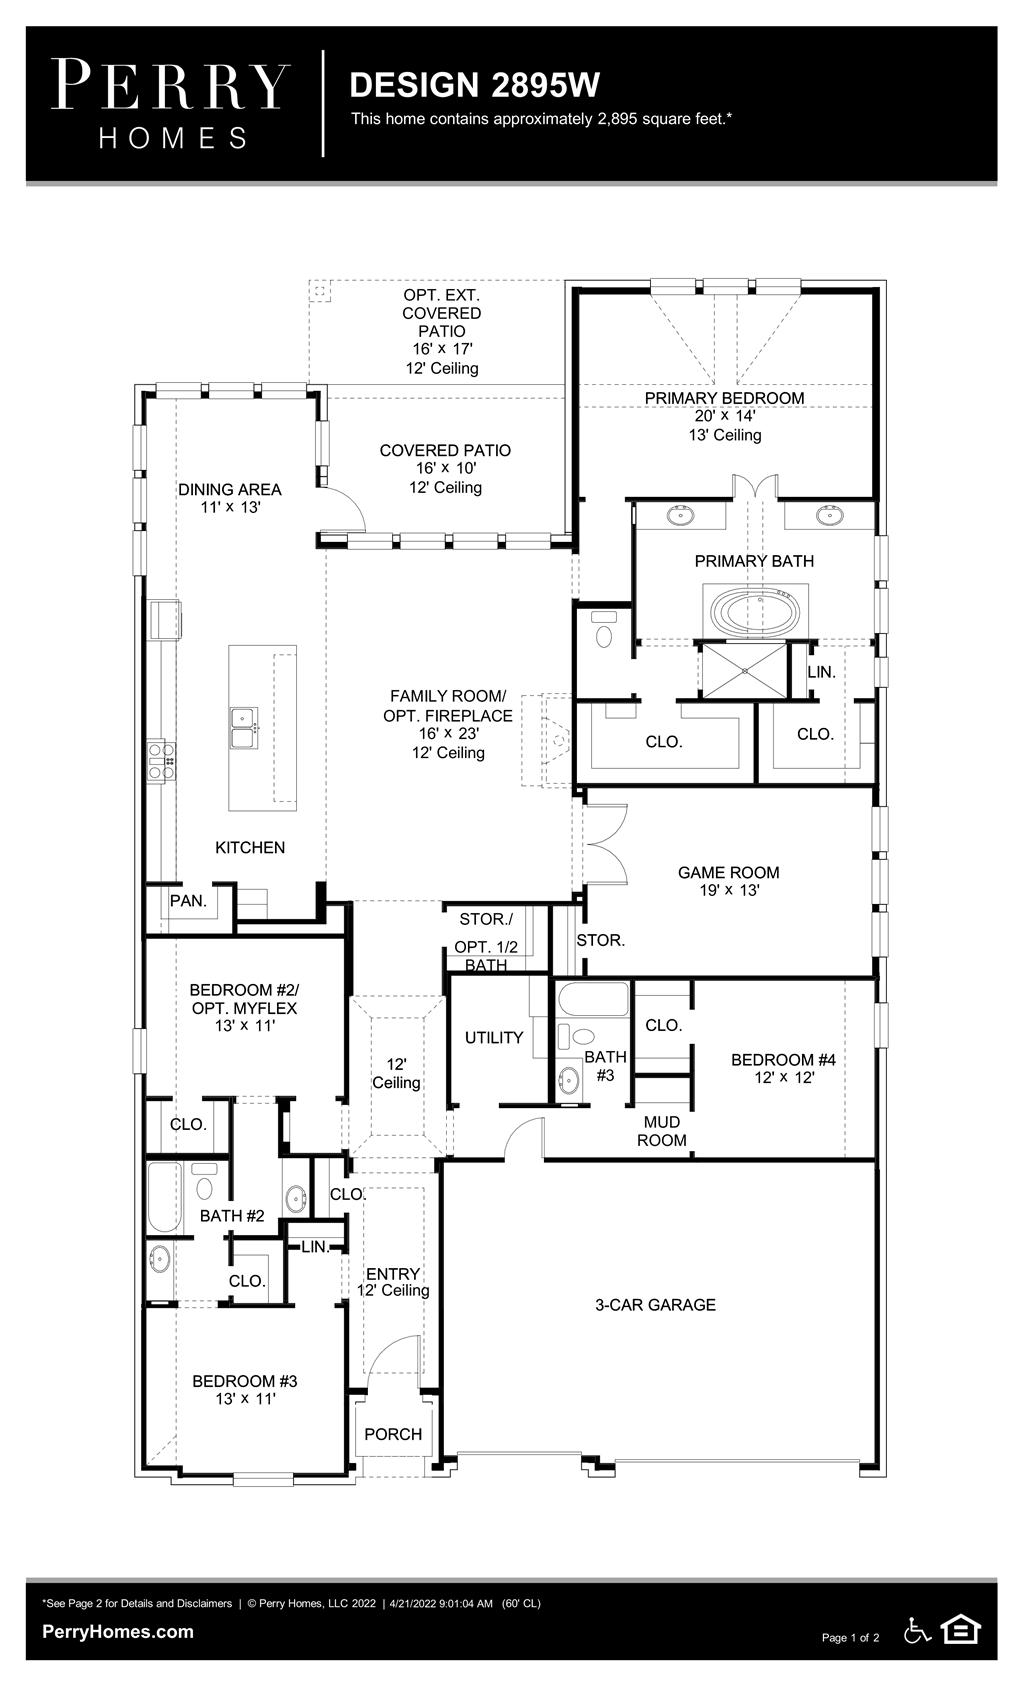 Floor Plan for 2895W